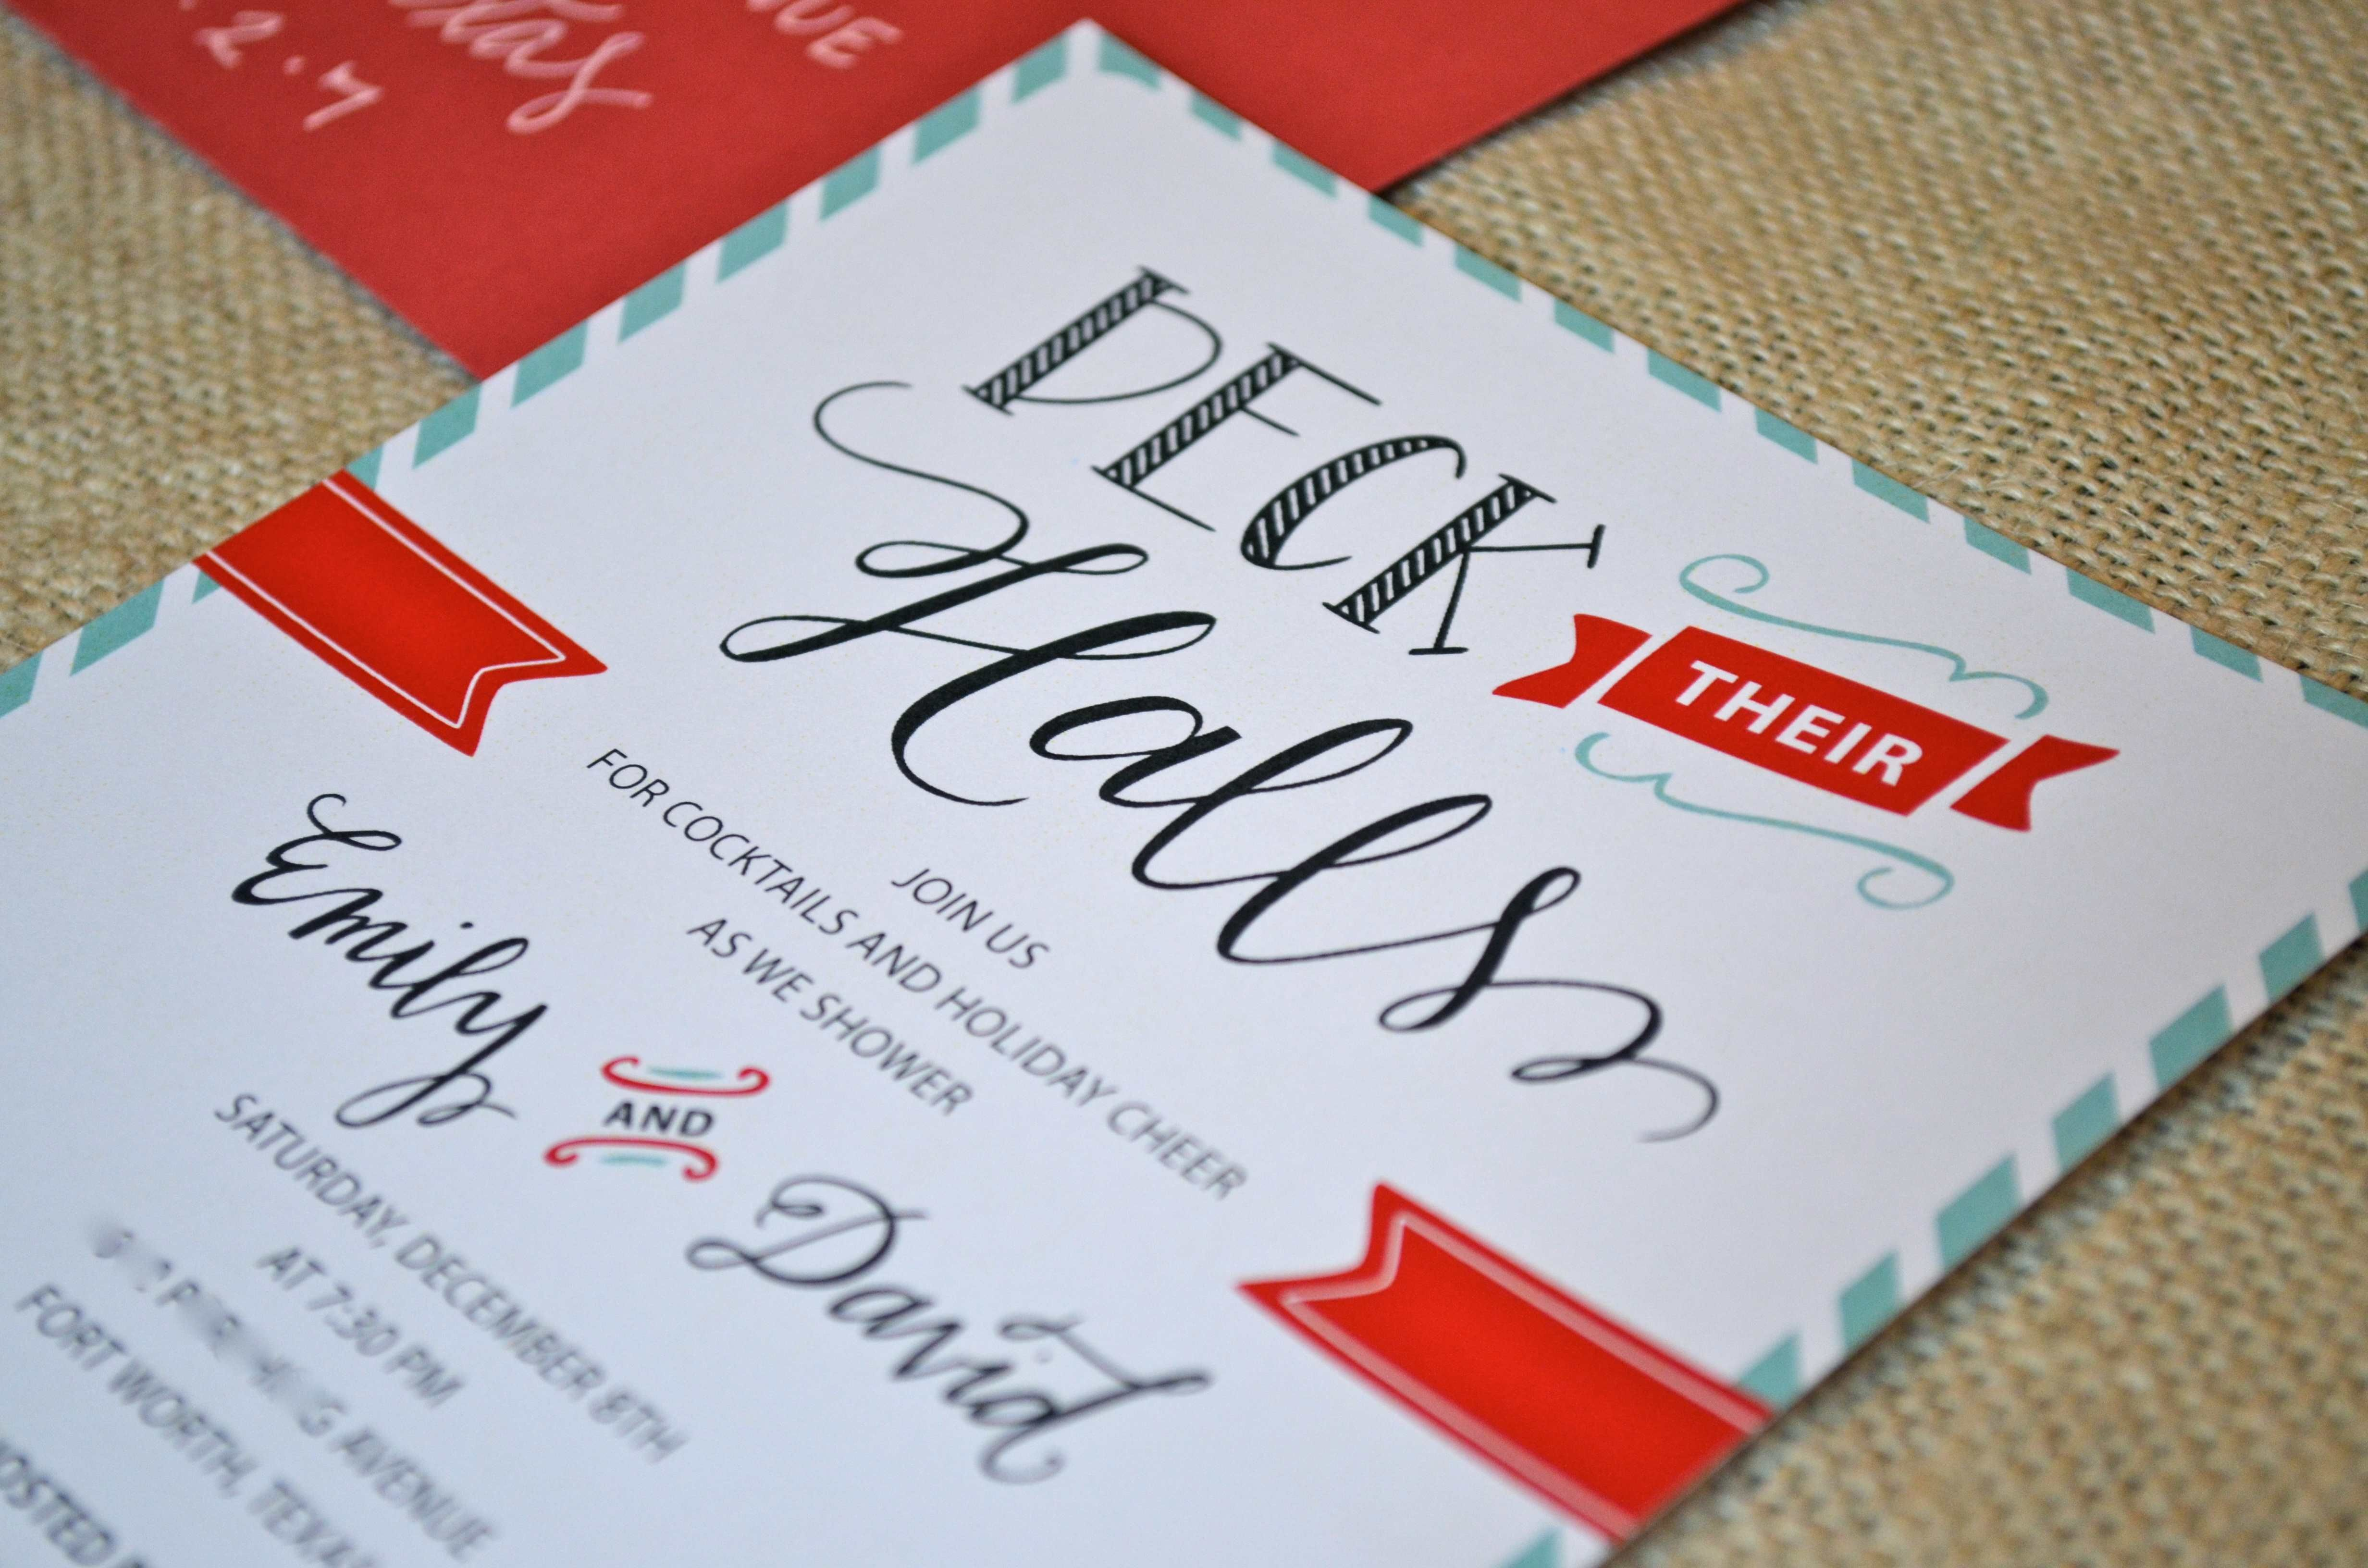 Wedding shower invitations christmas theme picture ideas references wedding shower invitations christmas theme customholidaycouplesweddingshowerinvitation jpg filmwisefo Image collections